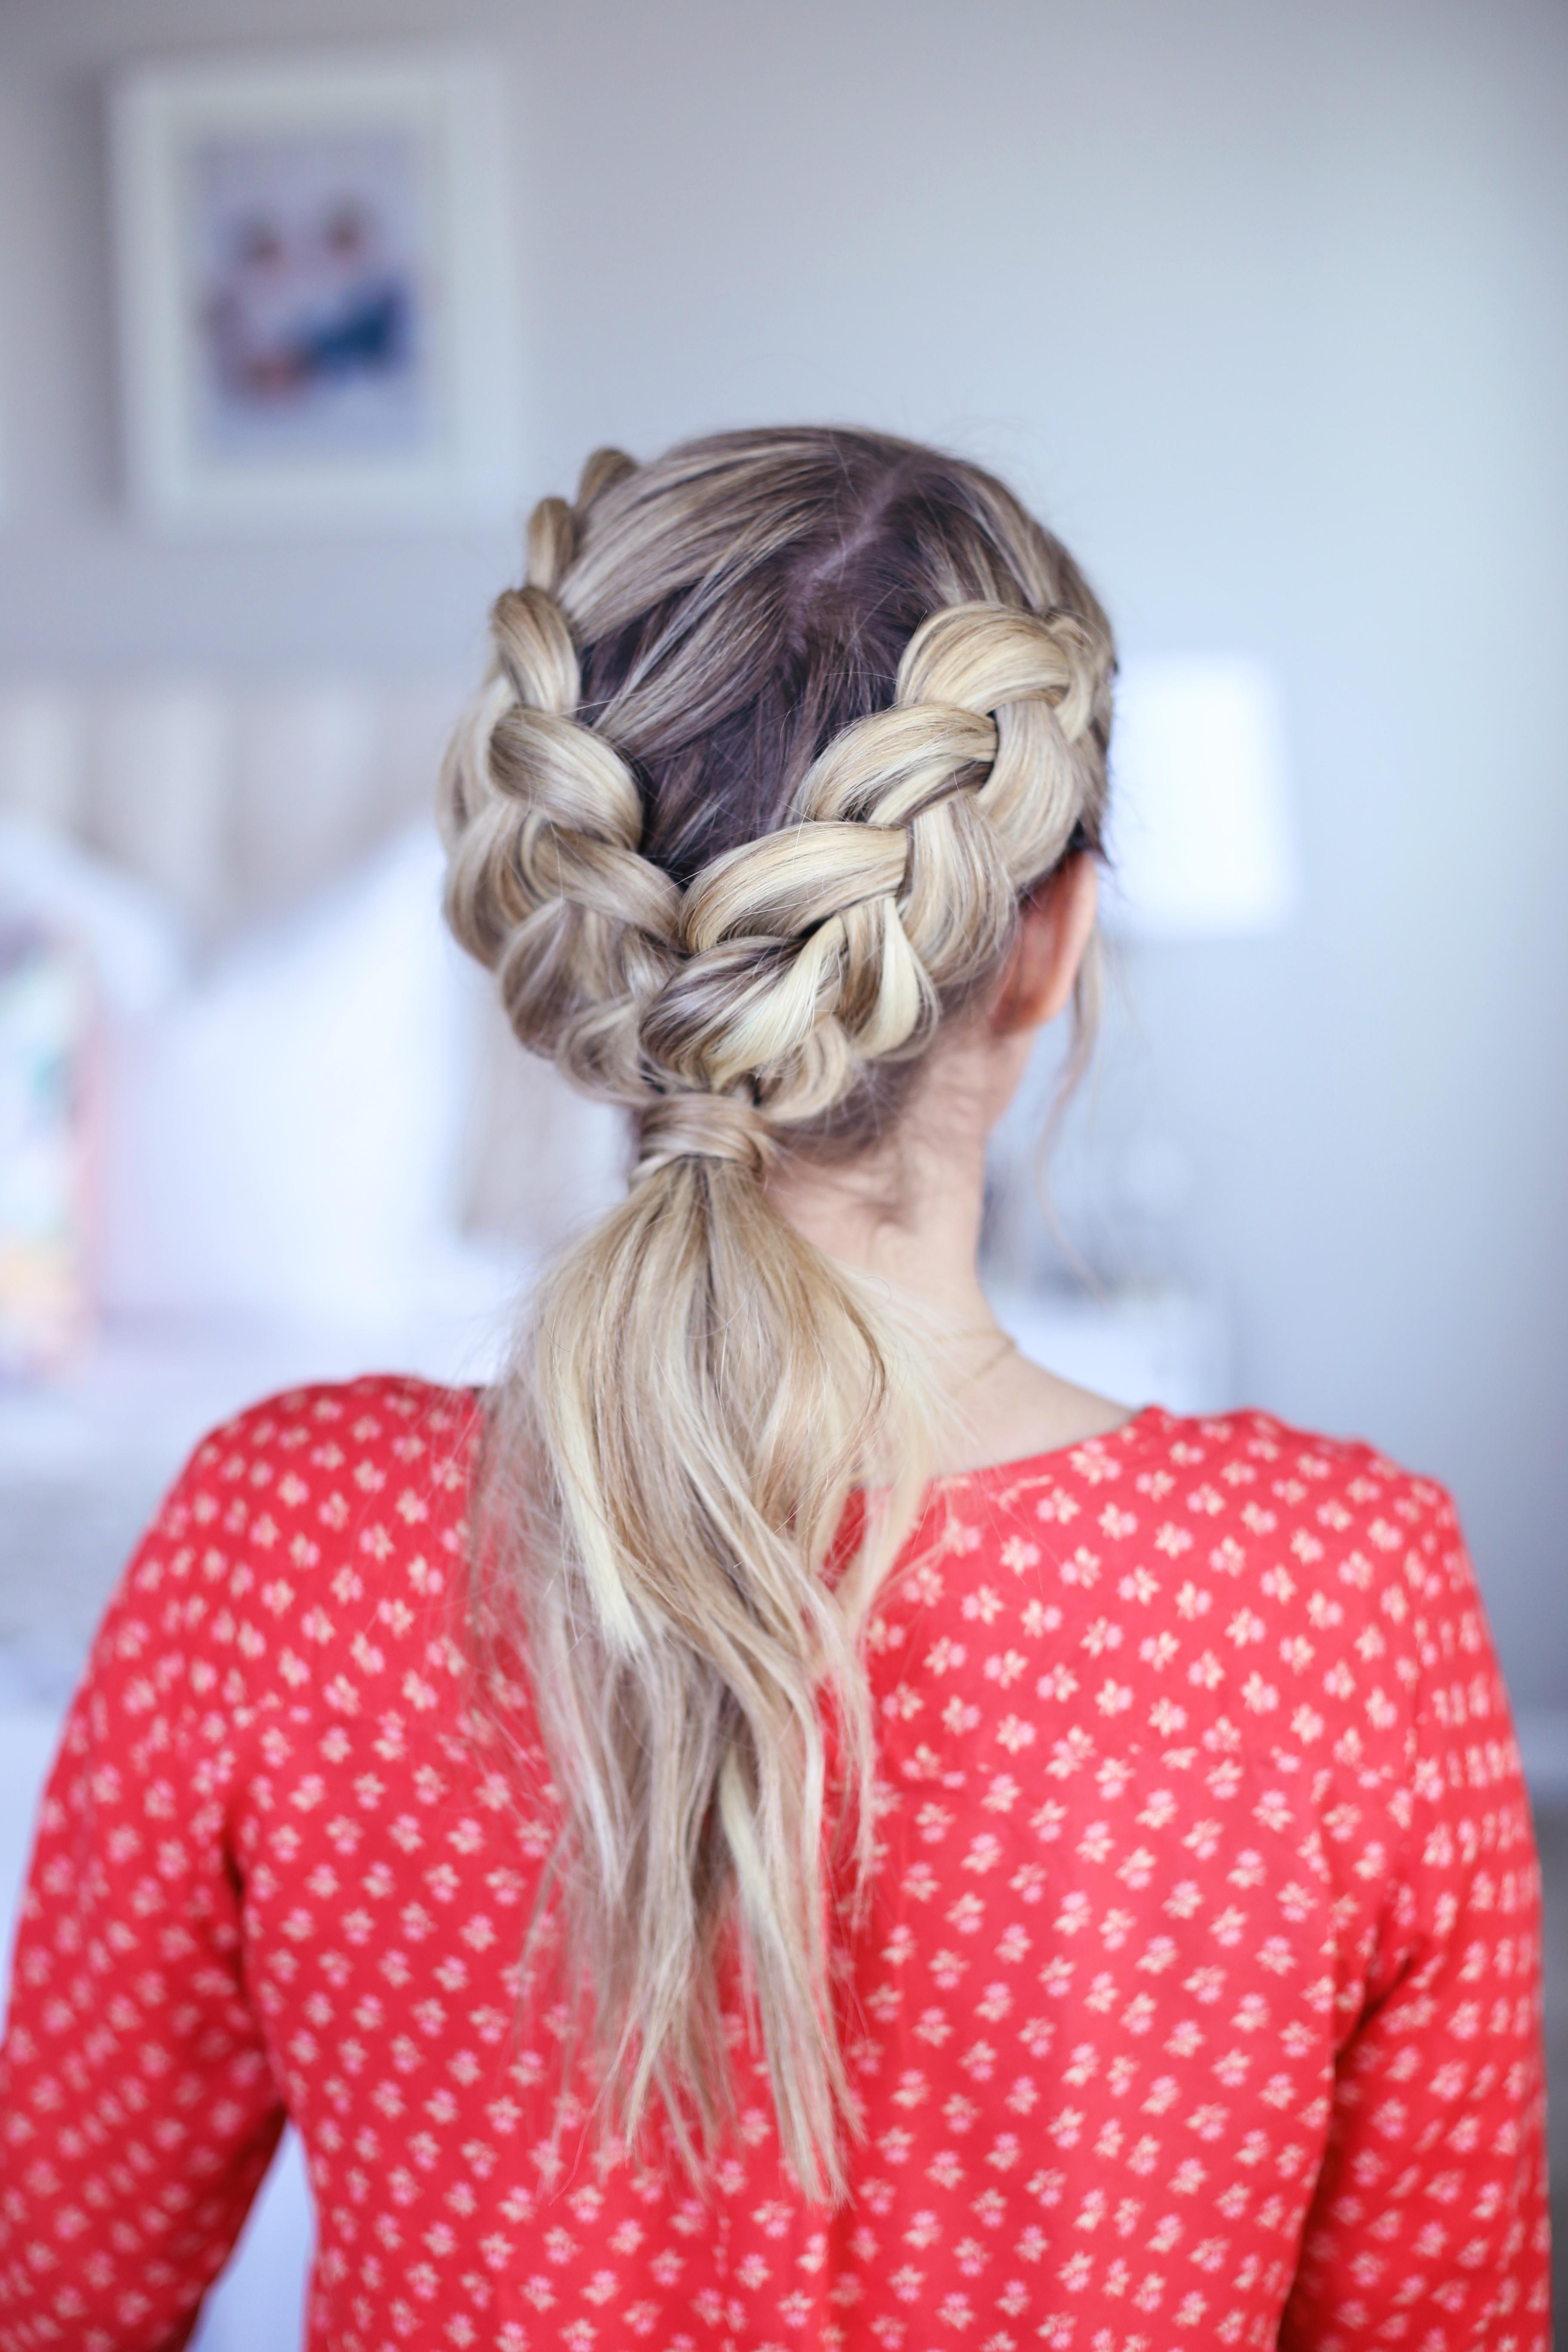 3-in-1 Double Dutch Braids - Cute Girls Hairstyles